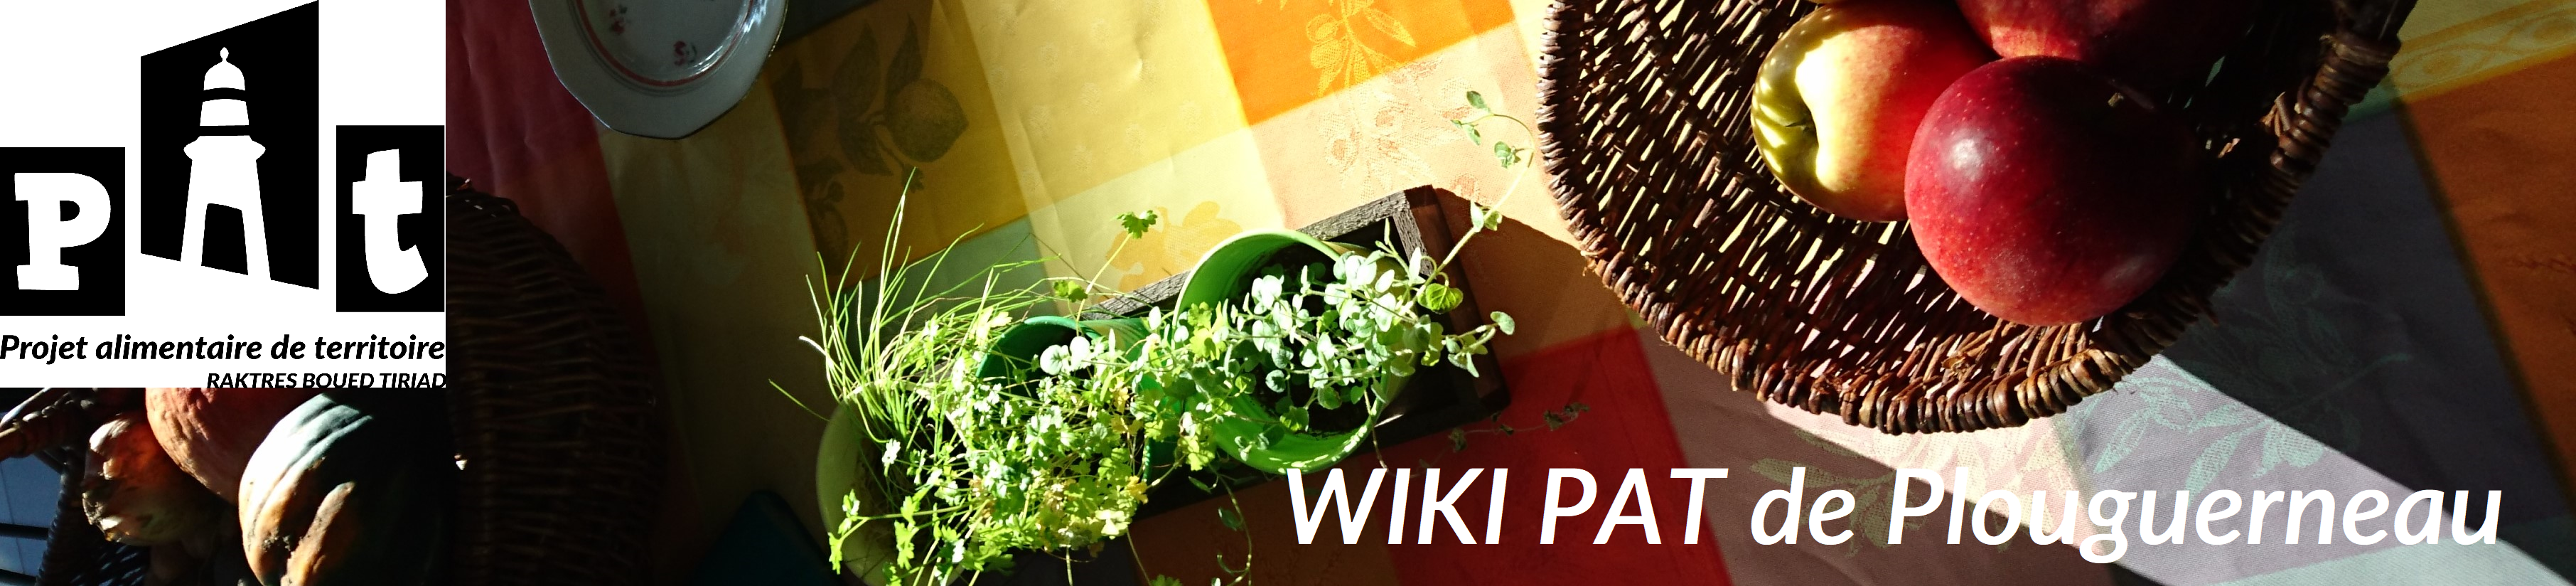 image bandeau_wiki.png (4.6MB)